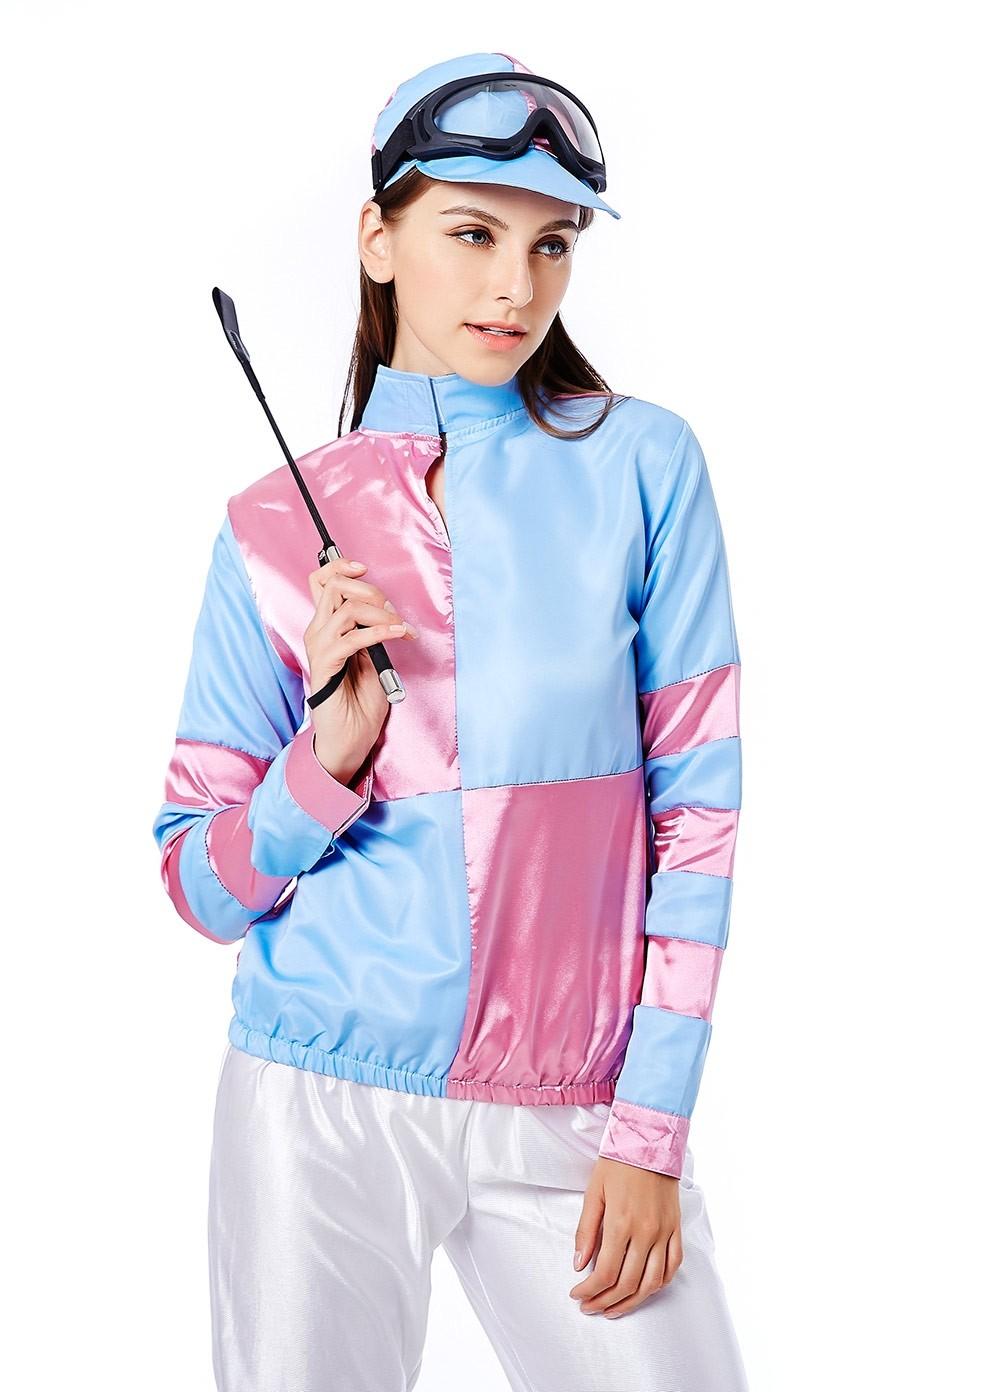 Womans Day Com >> Womans Jockey Horse Racing Rider Ladies Uniform Fancy ...